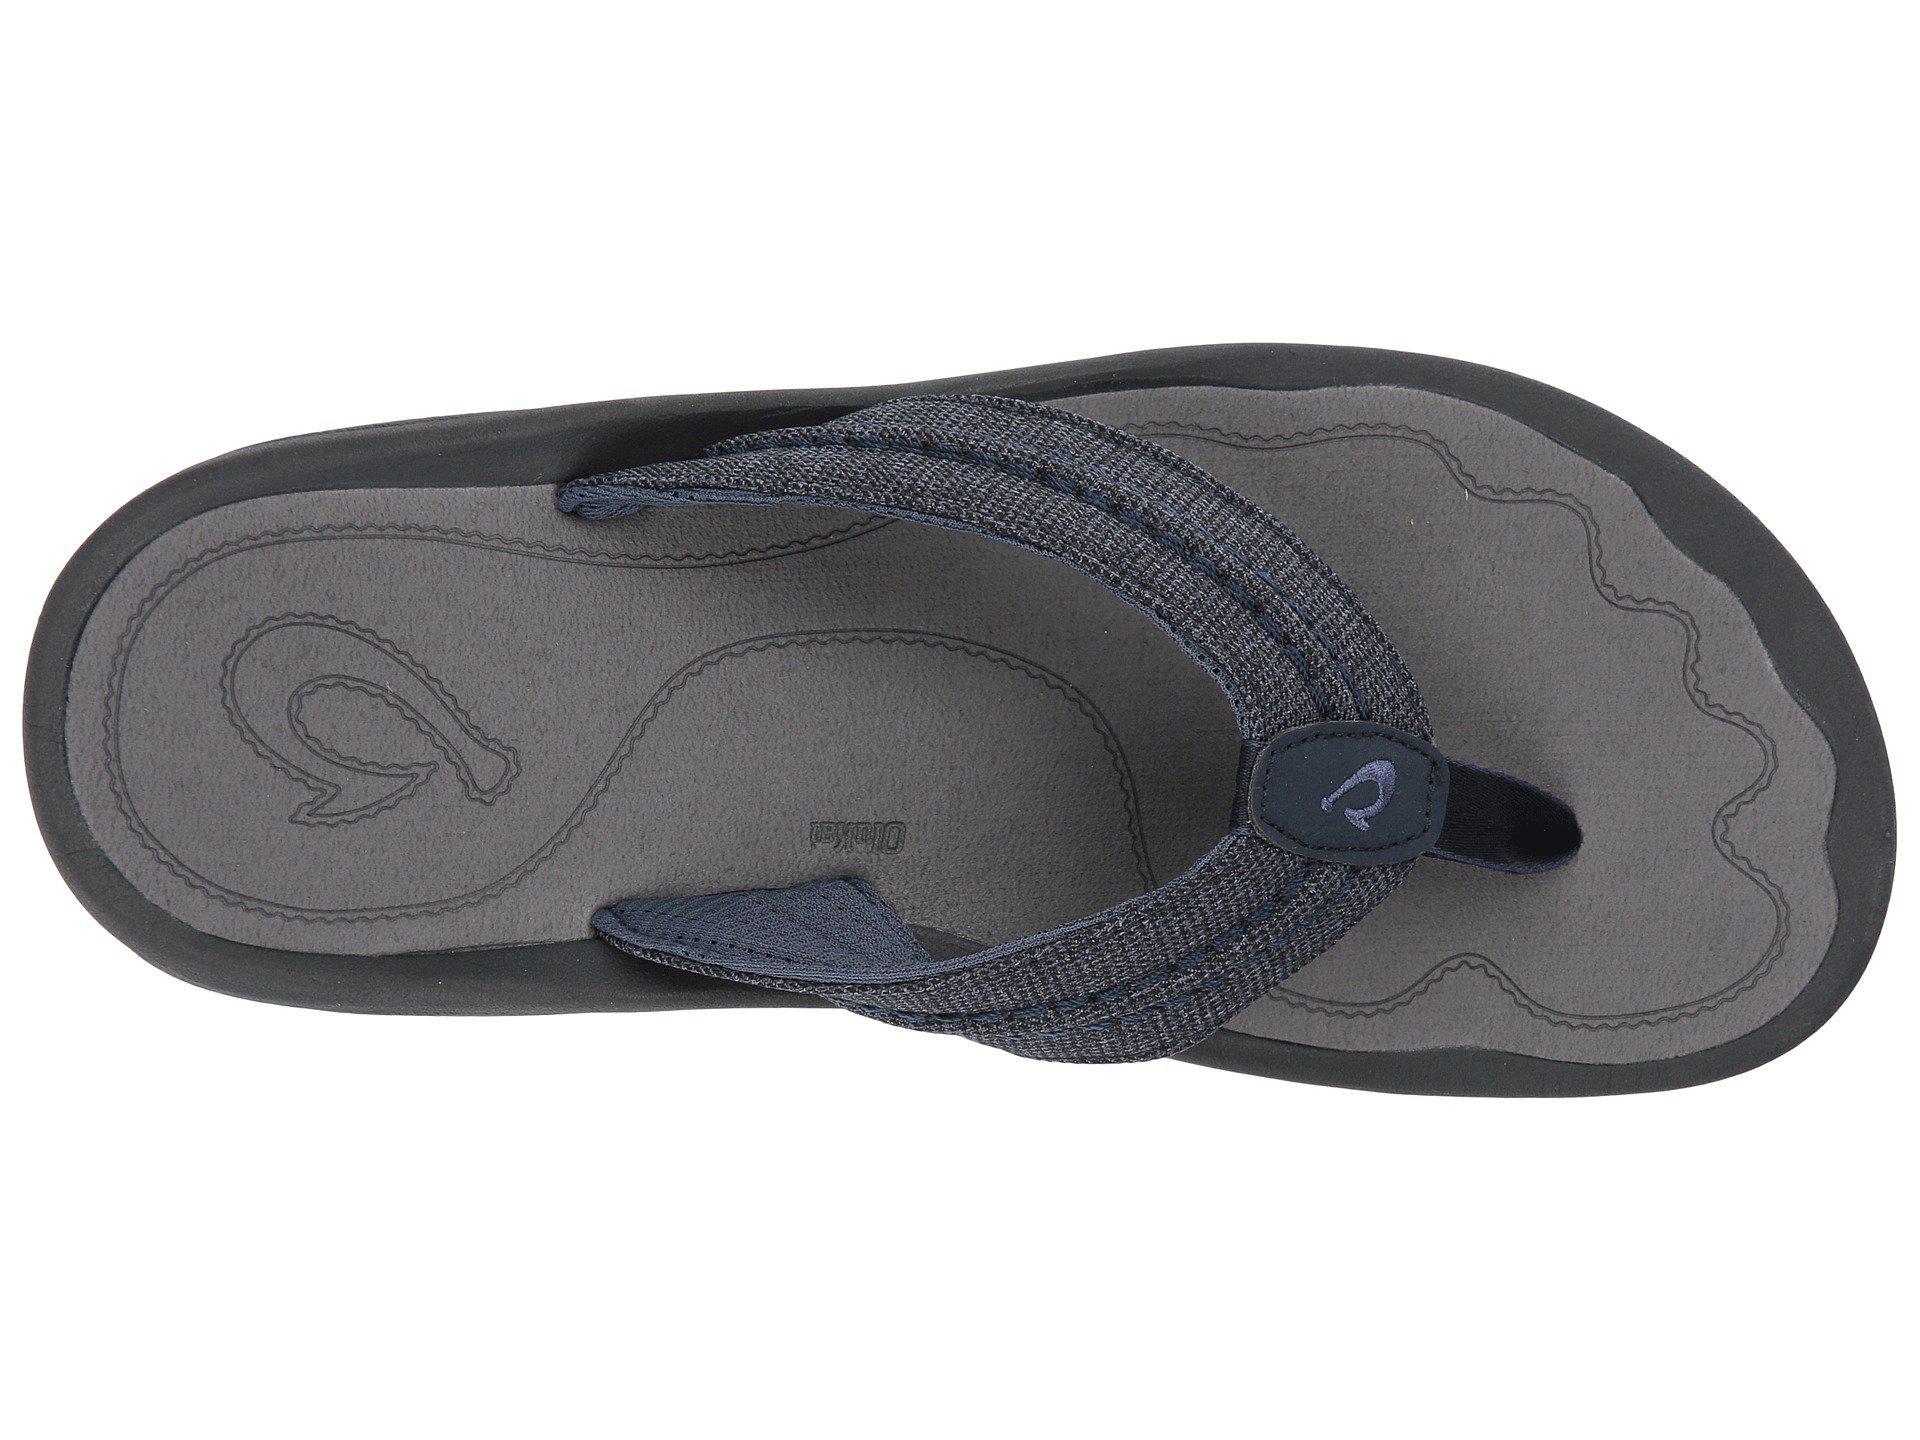 69bff023fae Olukai - Multicolor Hokua Mesh (night dark Shadow) Men s Sandals for Men -.  View fullscreen